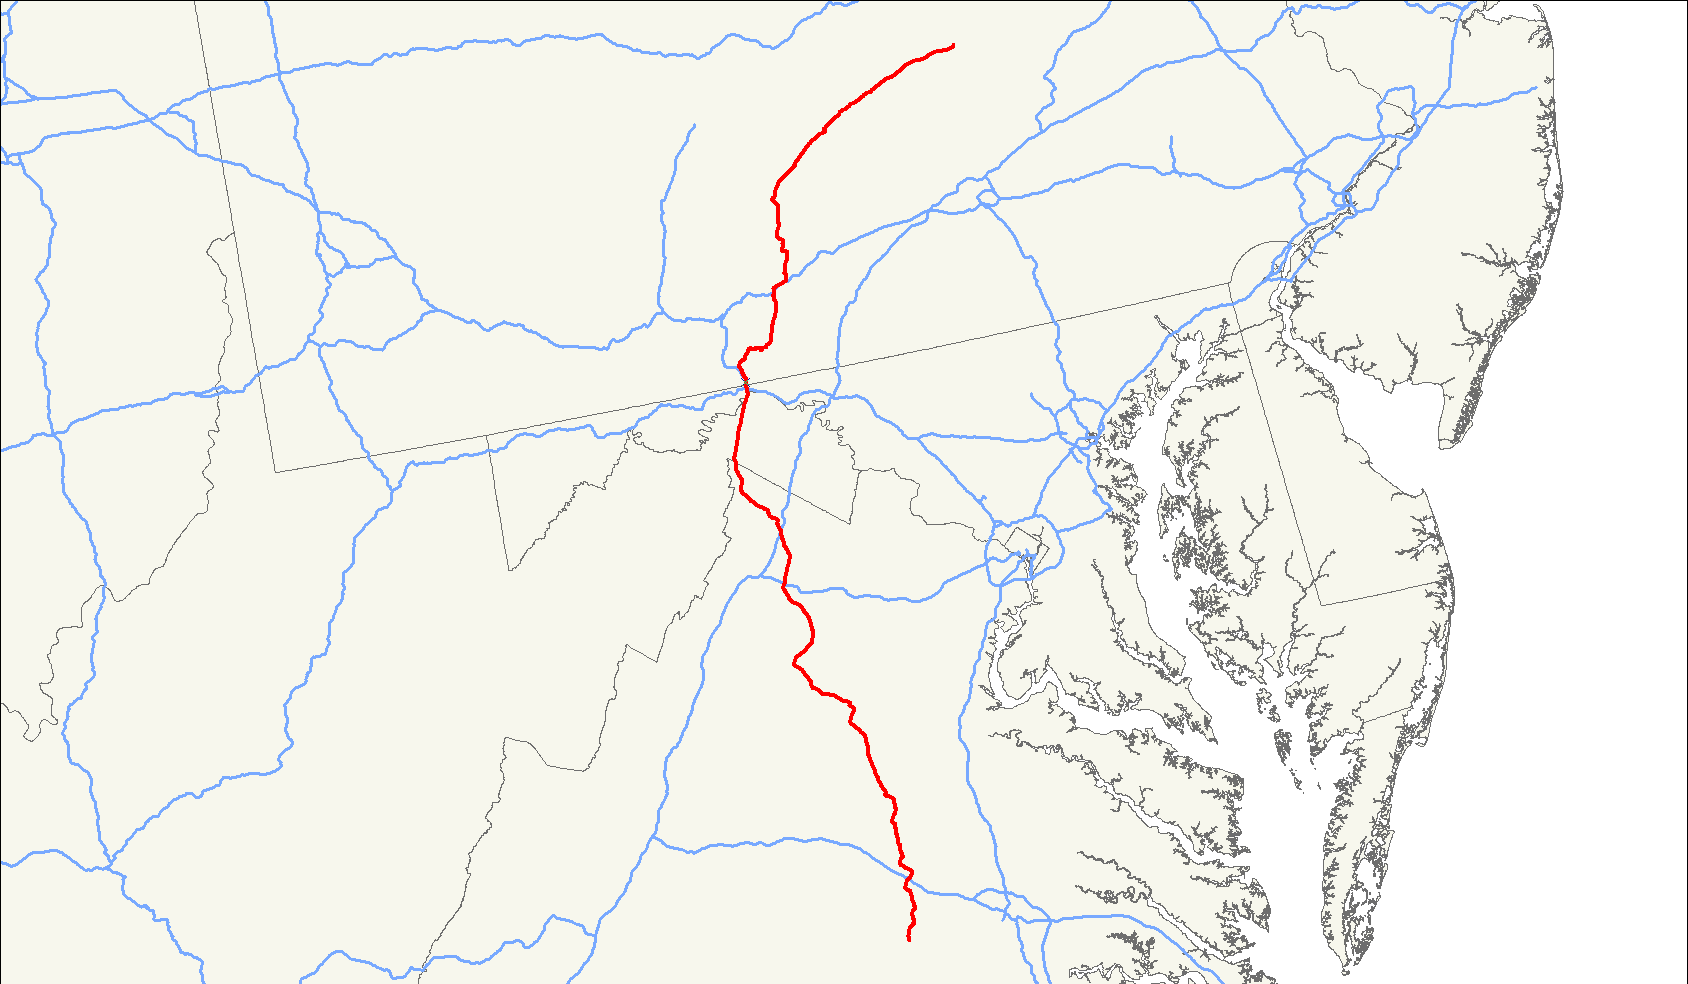 Route 522 Virginia Map.U S Route 522 Wikipedia